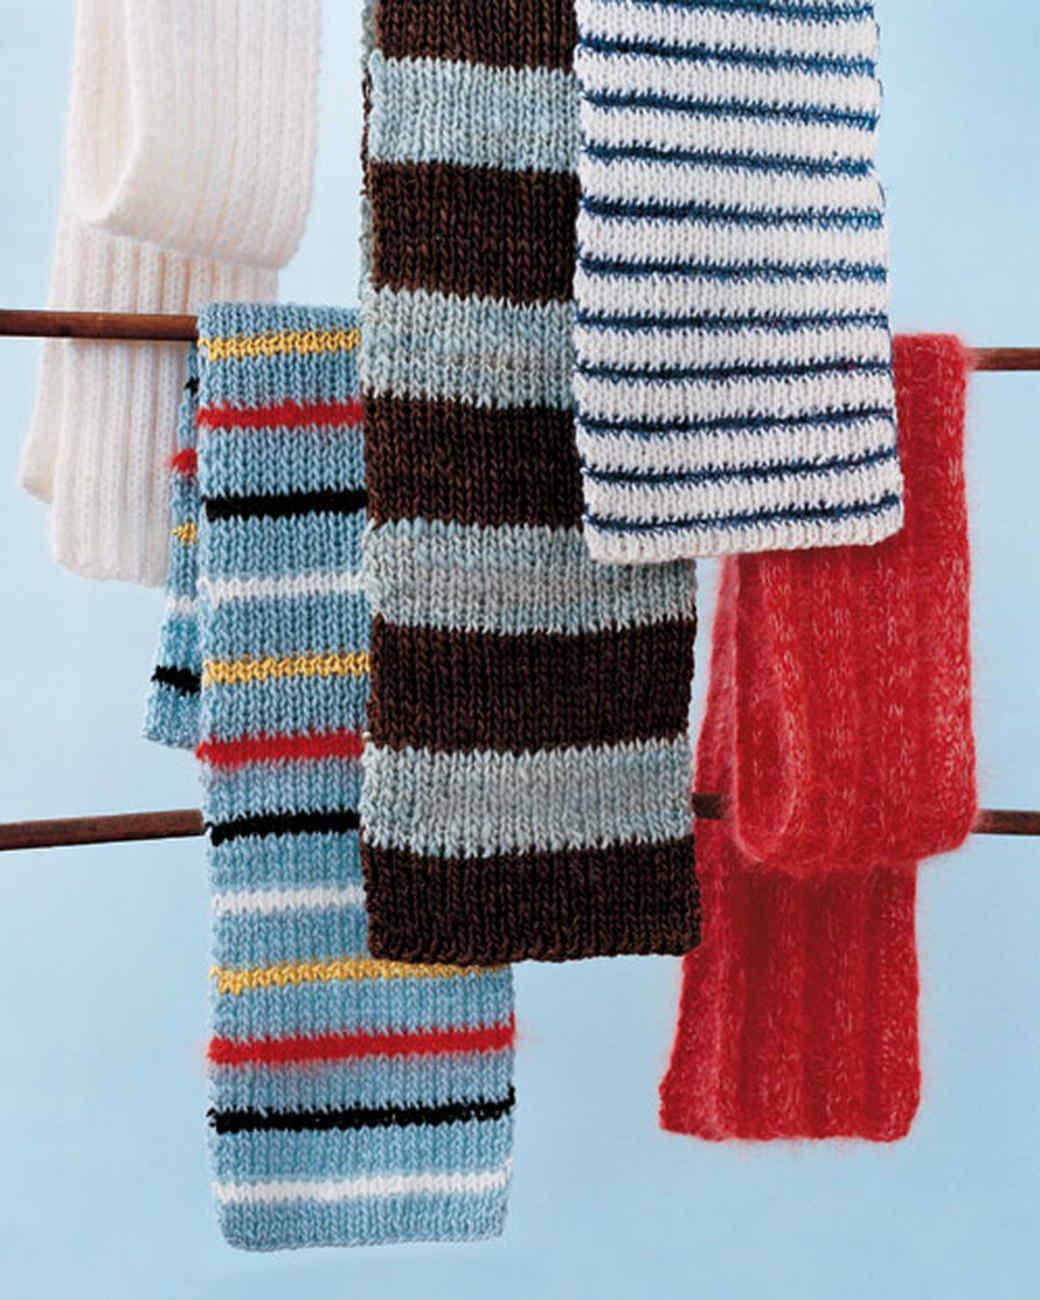 10 Striped Scarf Knitting Pattern - The Funky Stitch